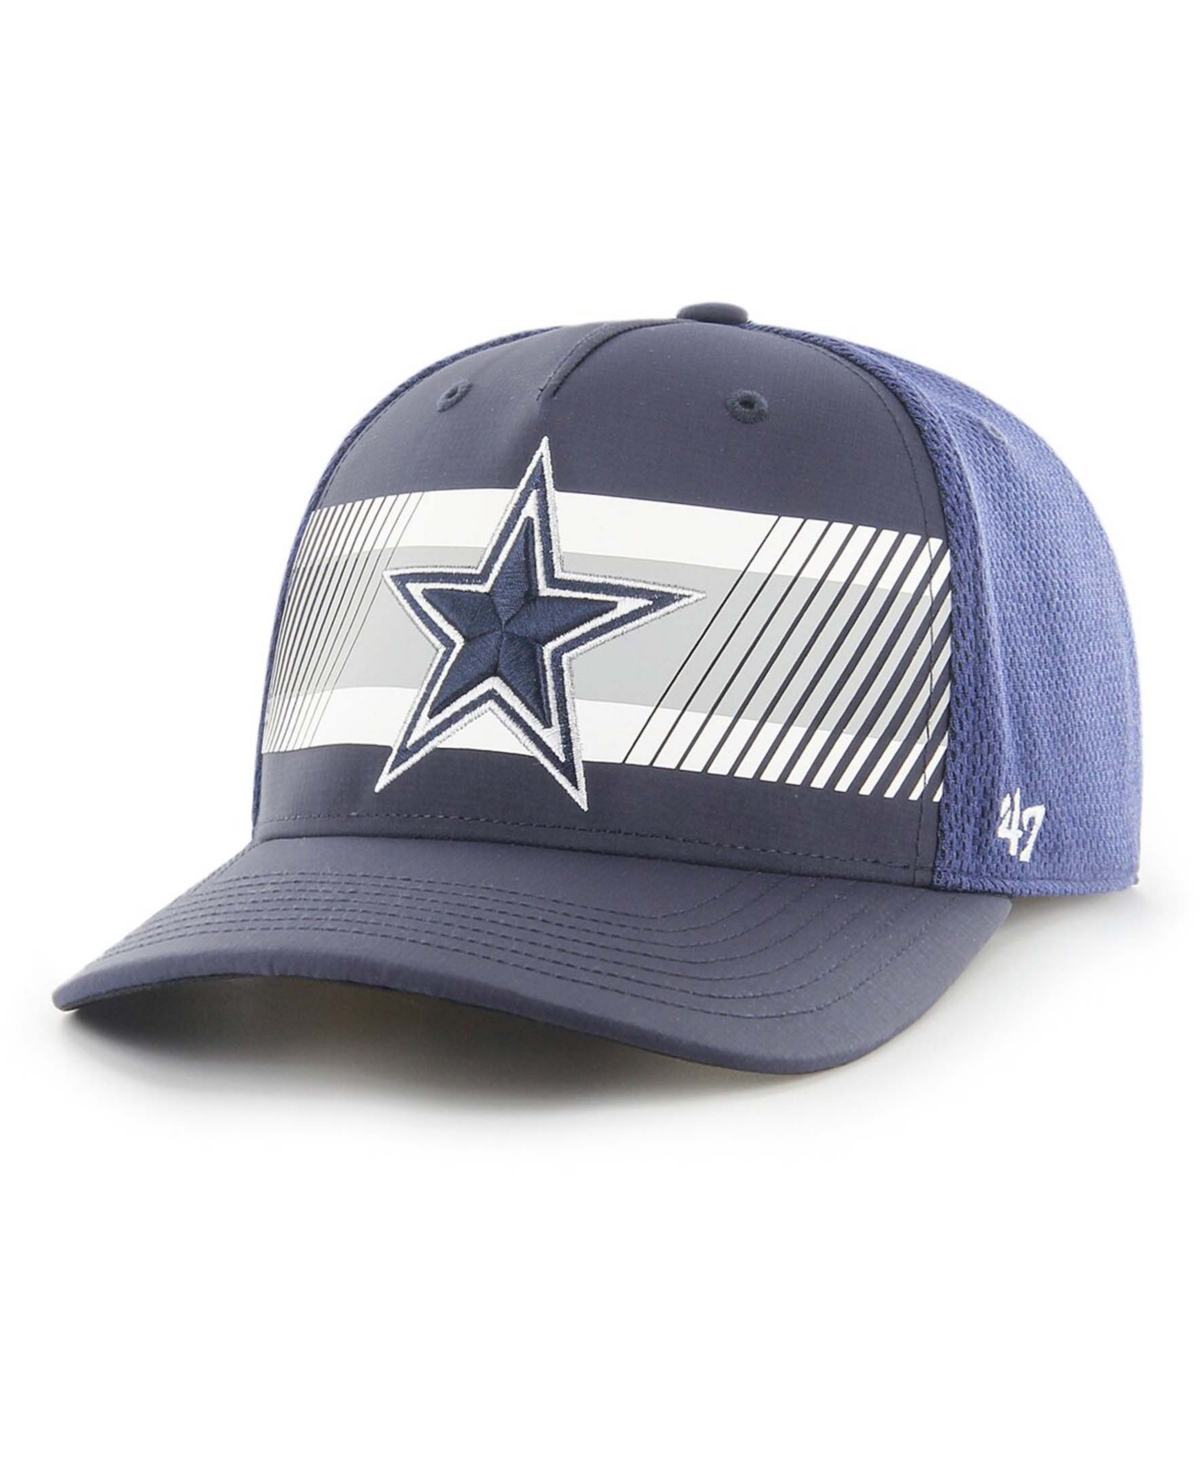 Mens Navy Dallas Cowboys Stutter Mvp Dv Adjustable Hat